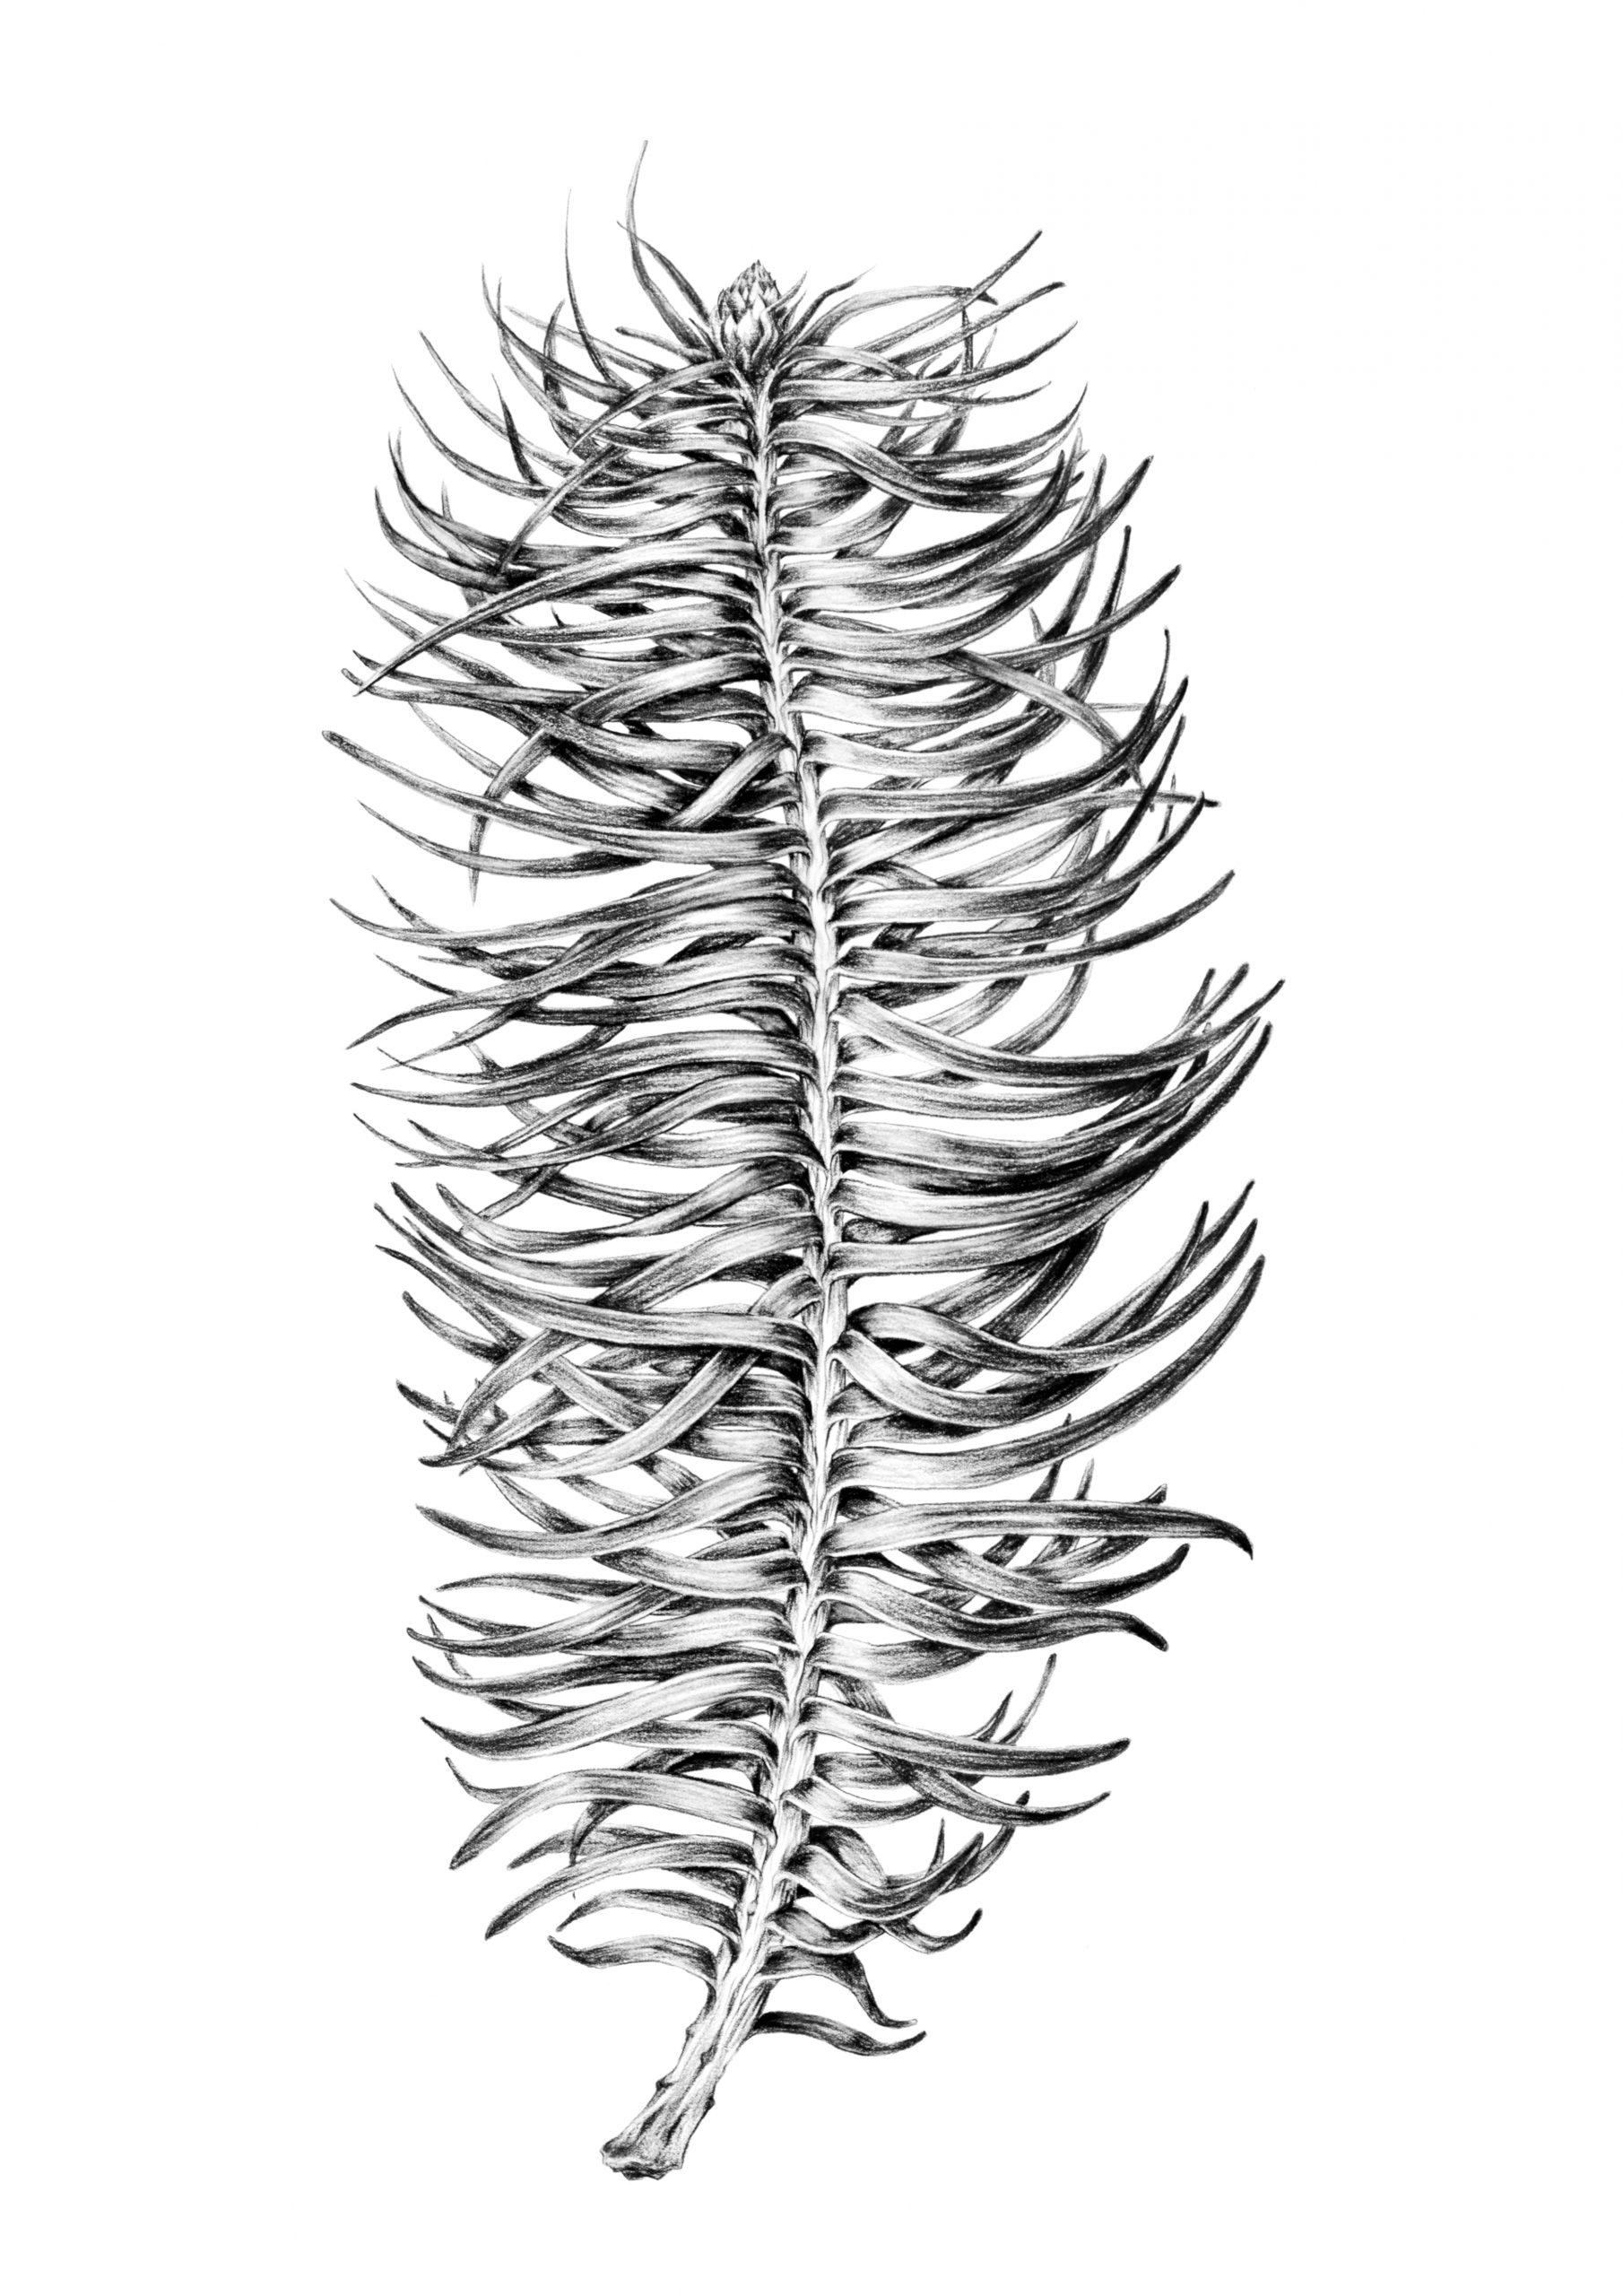 Cunninghamia lanceolata drawing